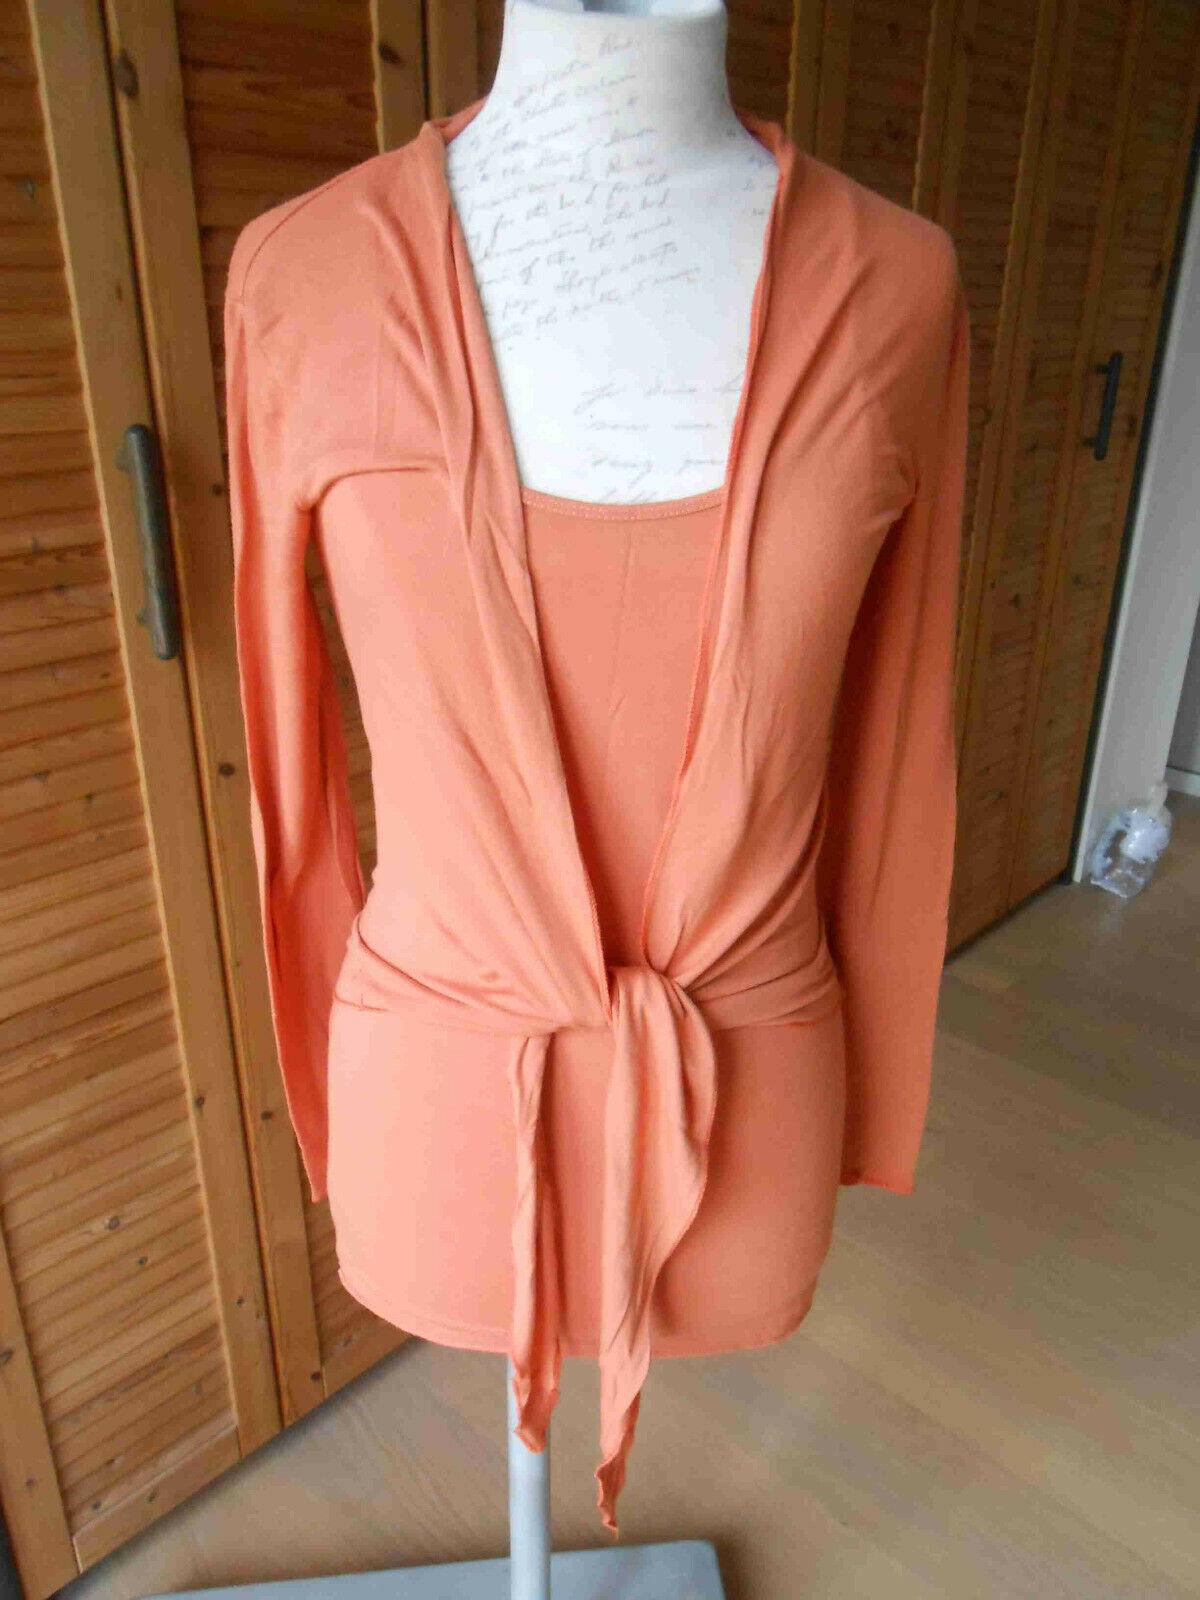 NOIR Bolero Jacke S 36 38 Top Unterkleid 2x Set made by ITALY Nachhemd Nachthemd